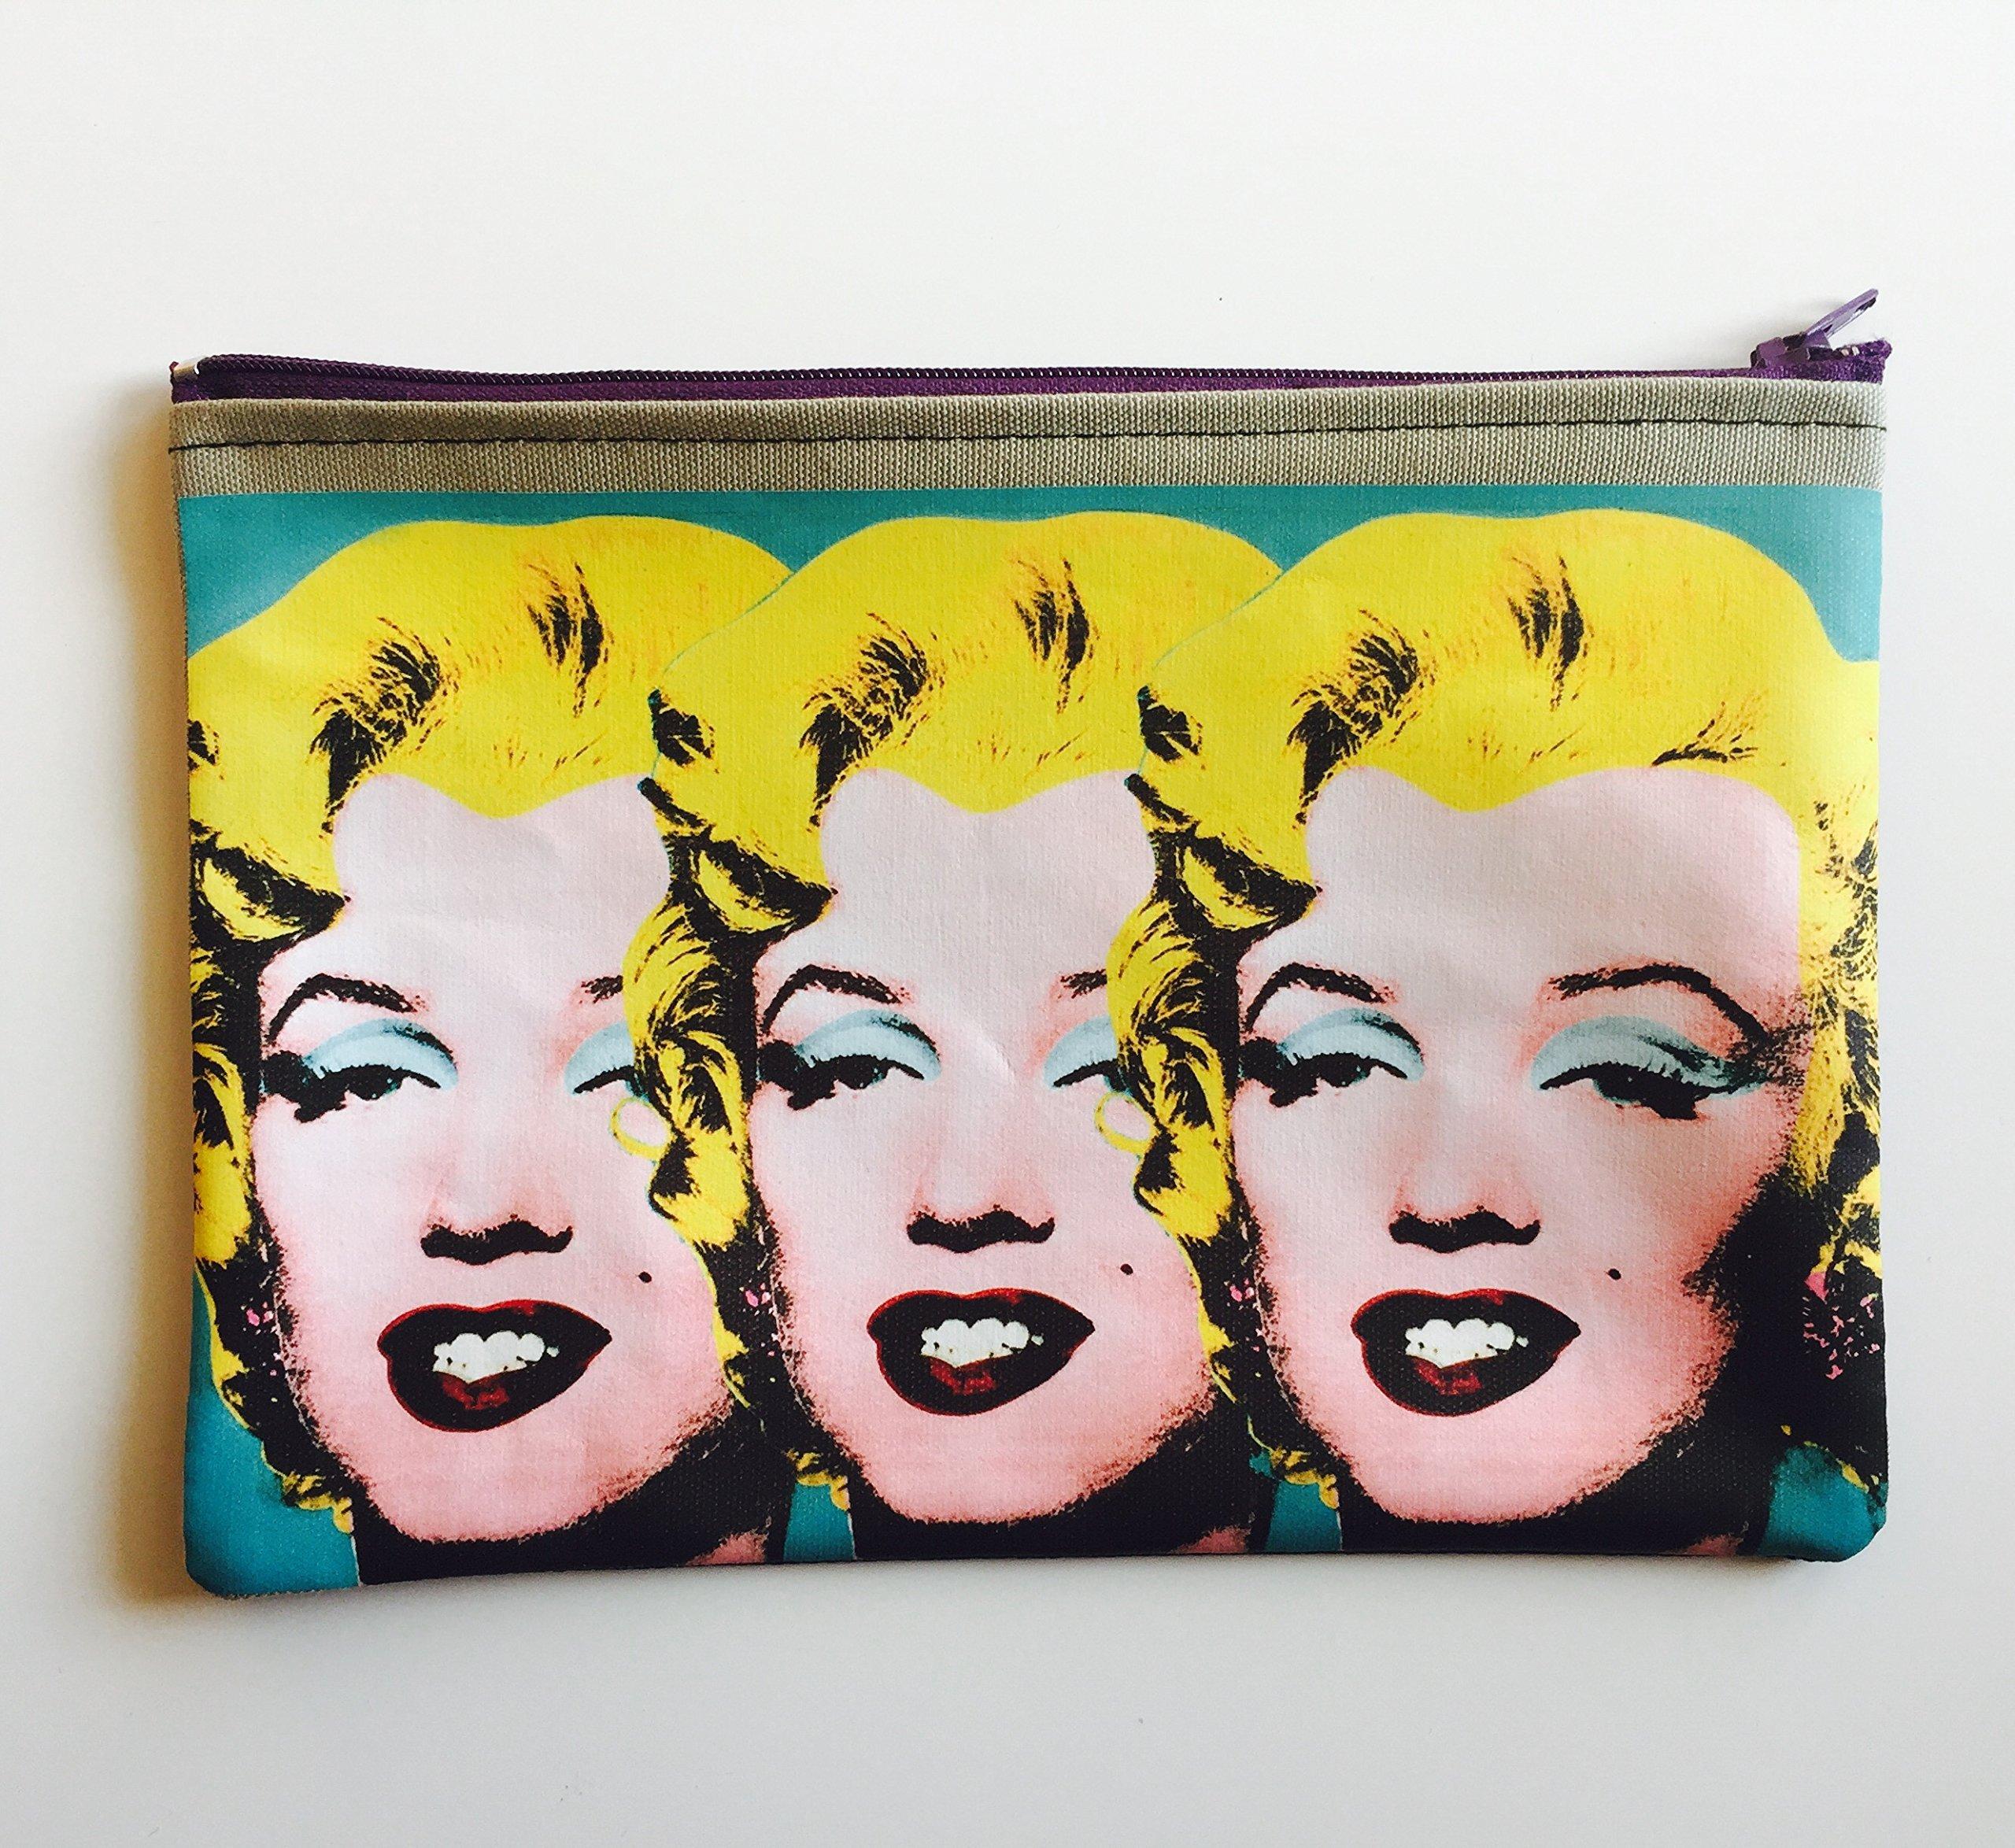 Marilyn Monroe Pop Art Pencil Case/ Pouch (multipurpose)